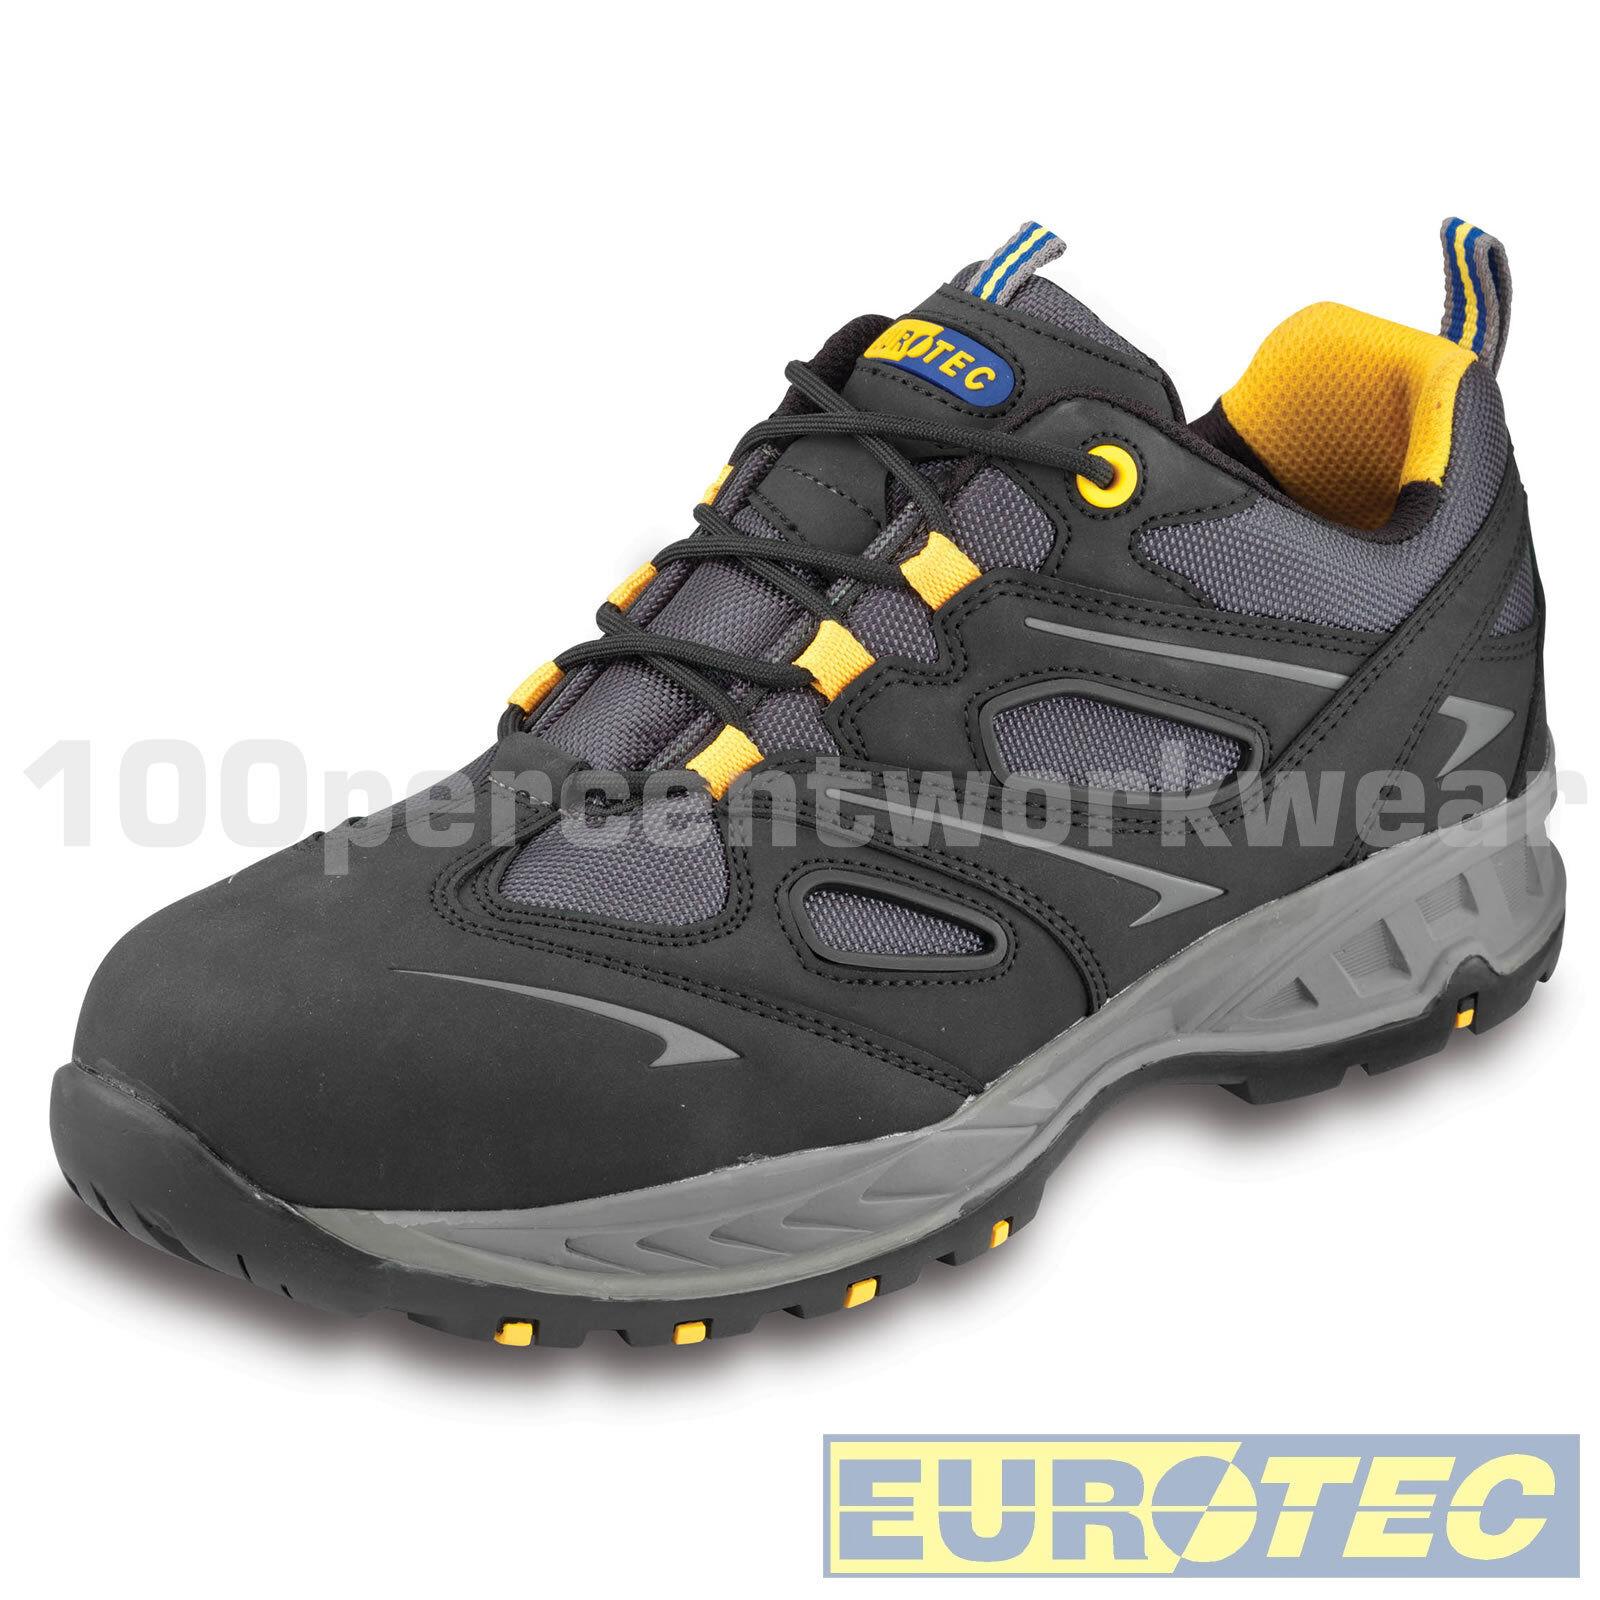 Euredec 715NMP Black Nubuck Leather Mesh Safety Work Trainers Composite Toe Cap